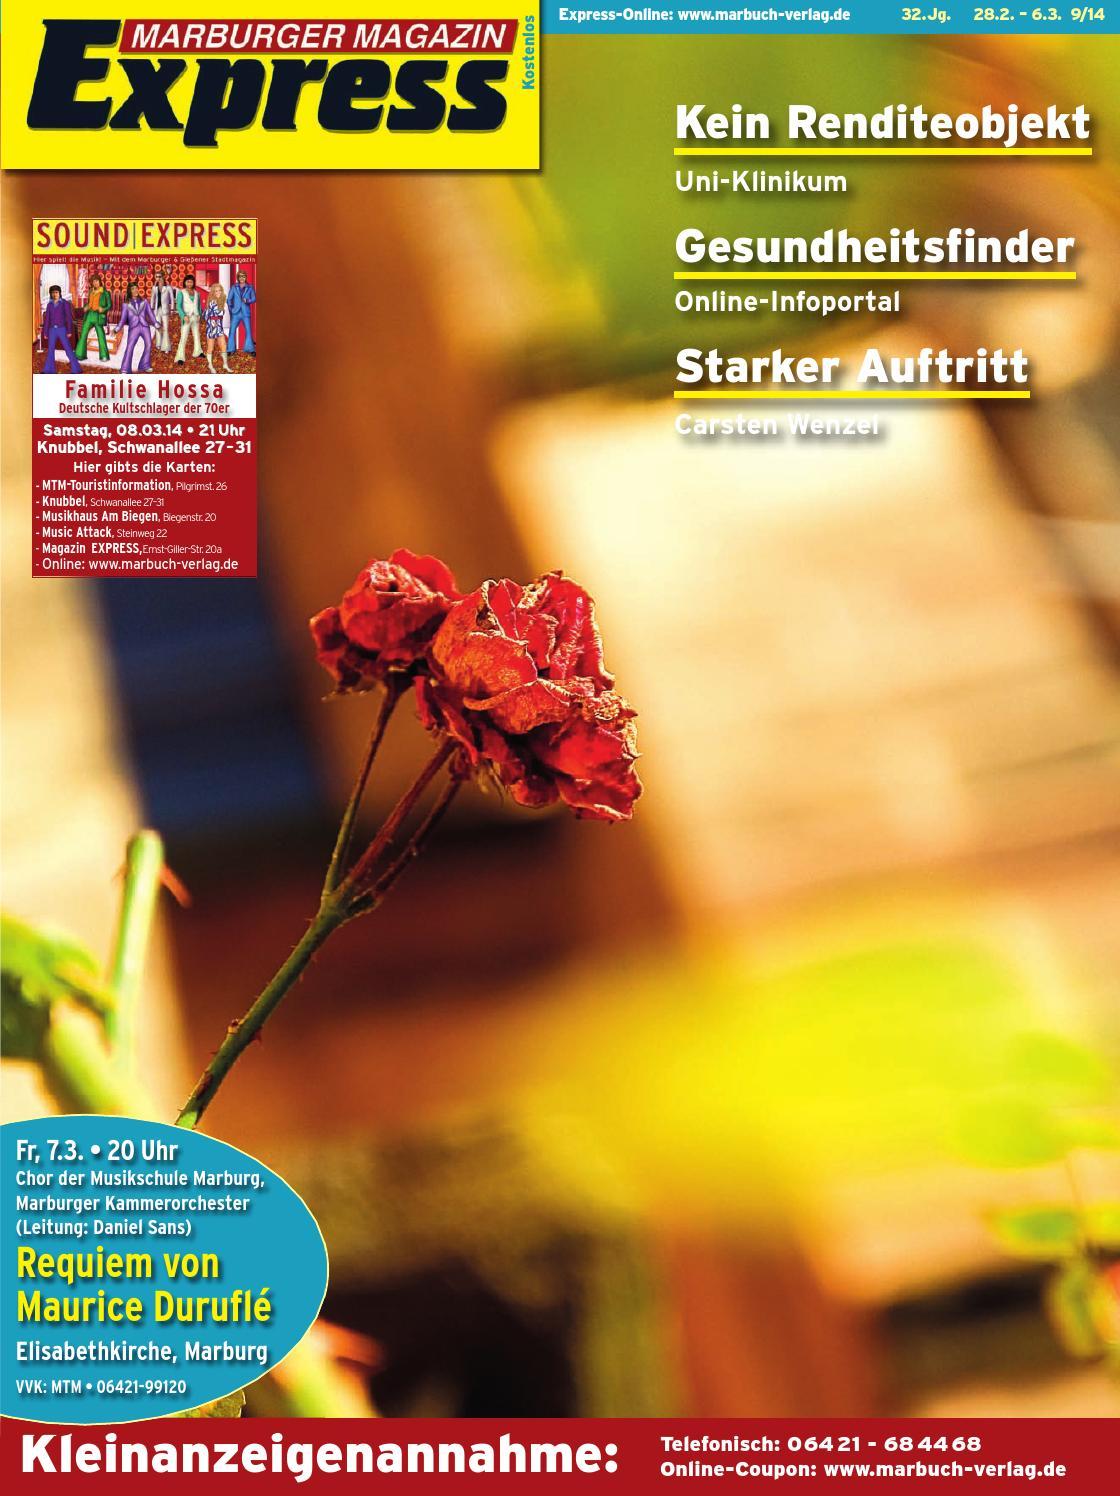 marburger magazin express 9 2014 by ulrich butterweck issuu. Black Bedroom Furniture Sets. Home Design Ideas